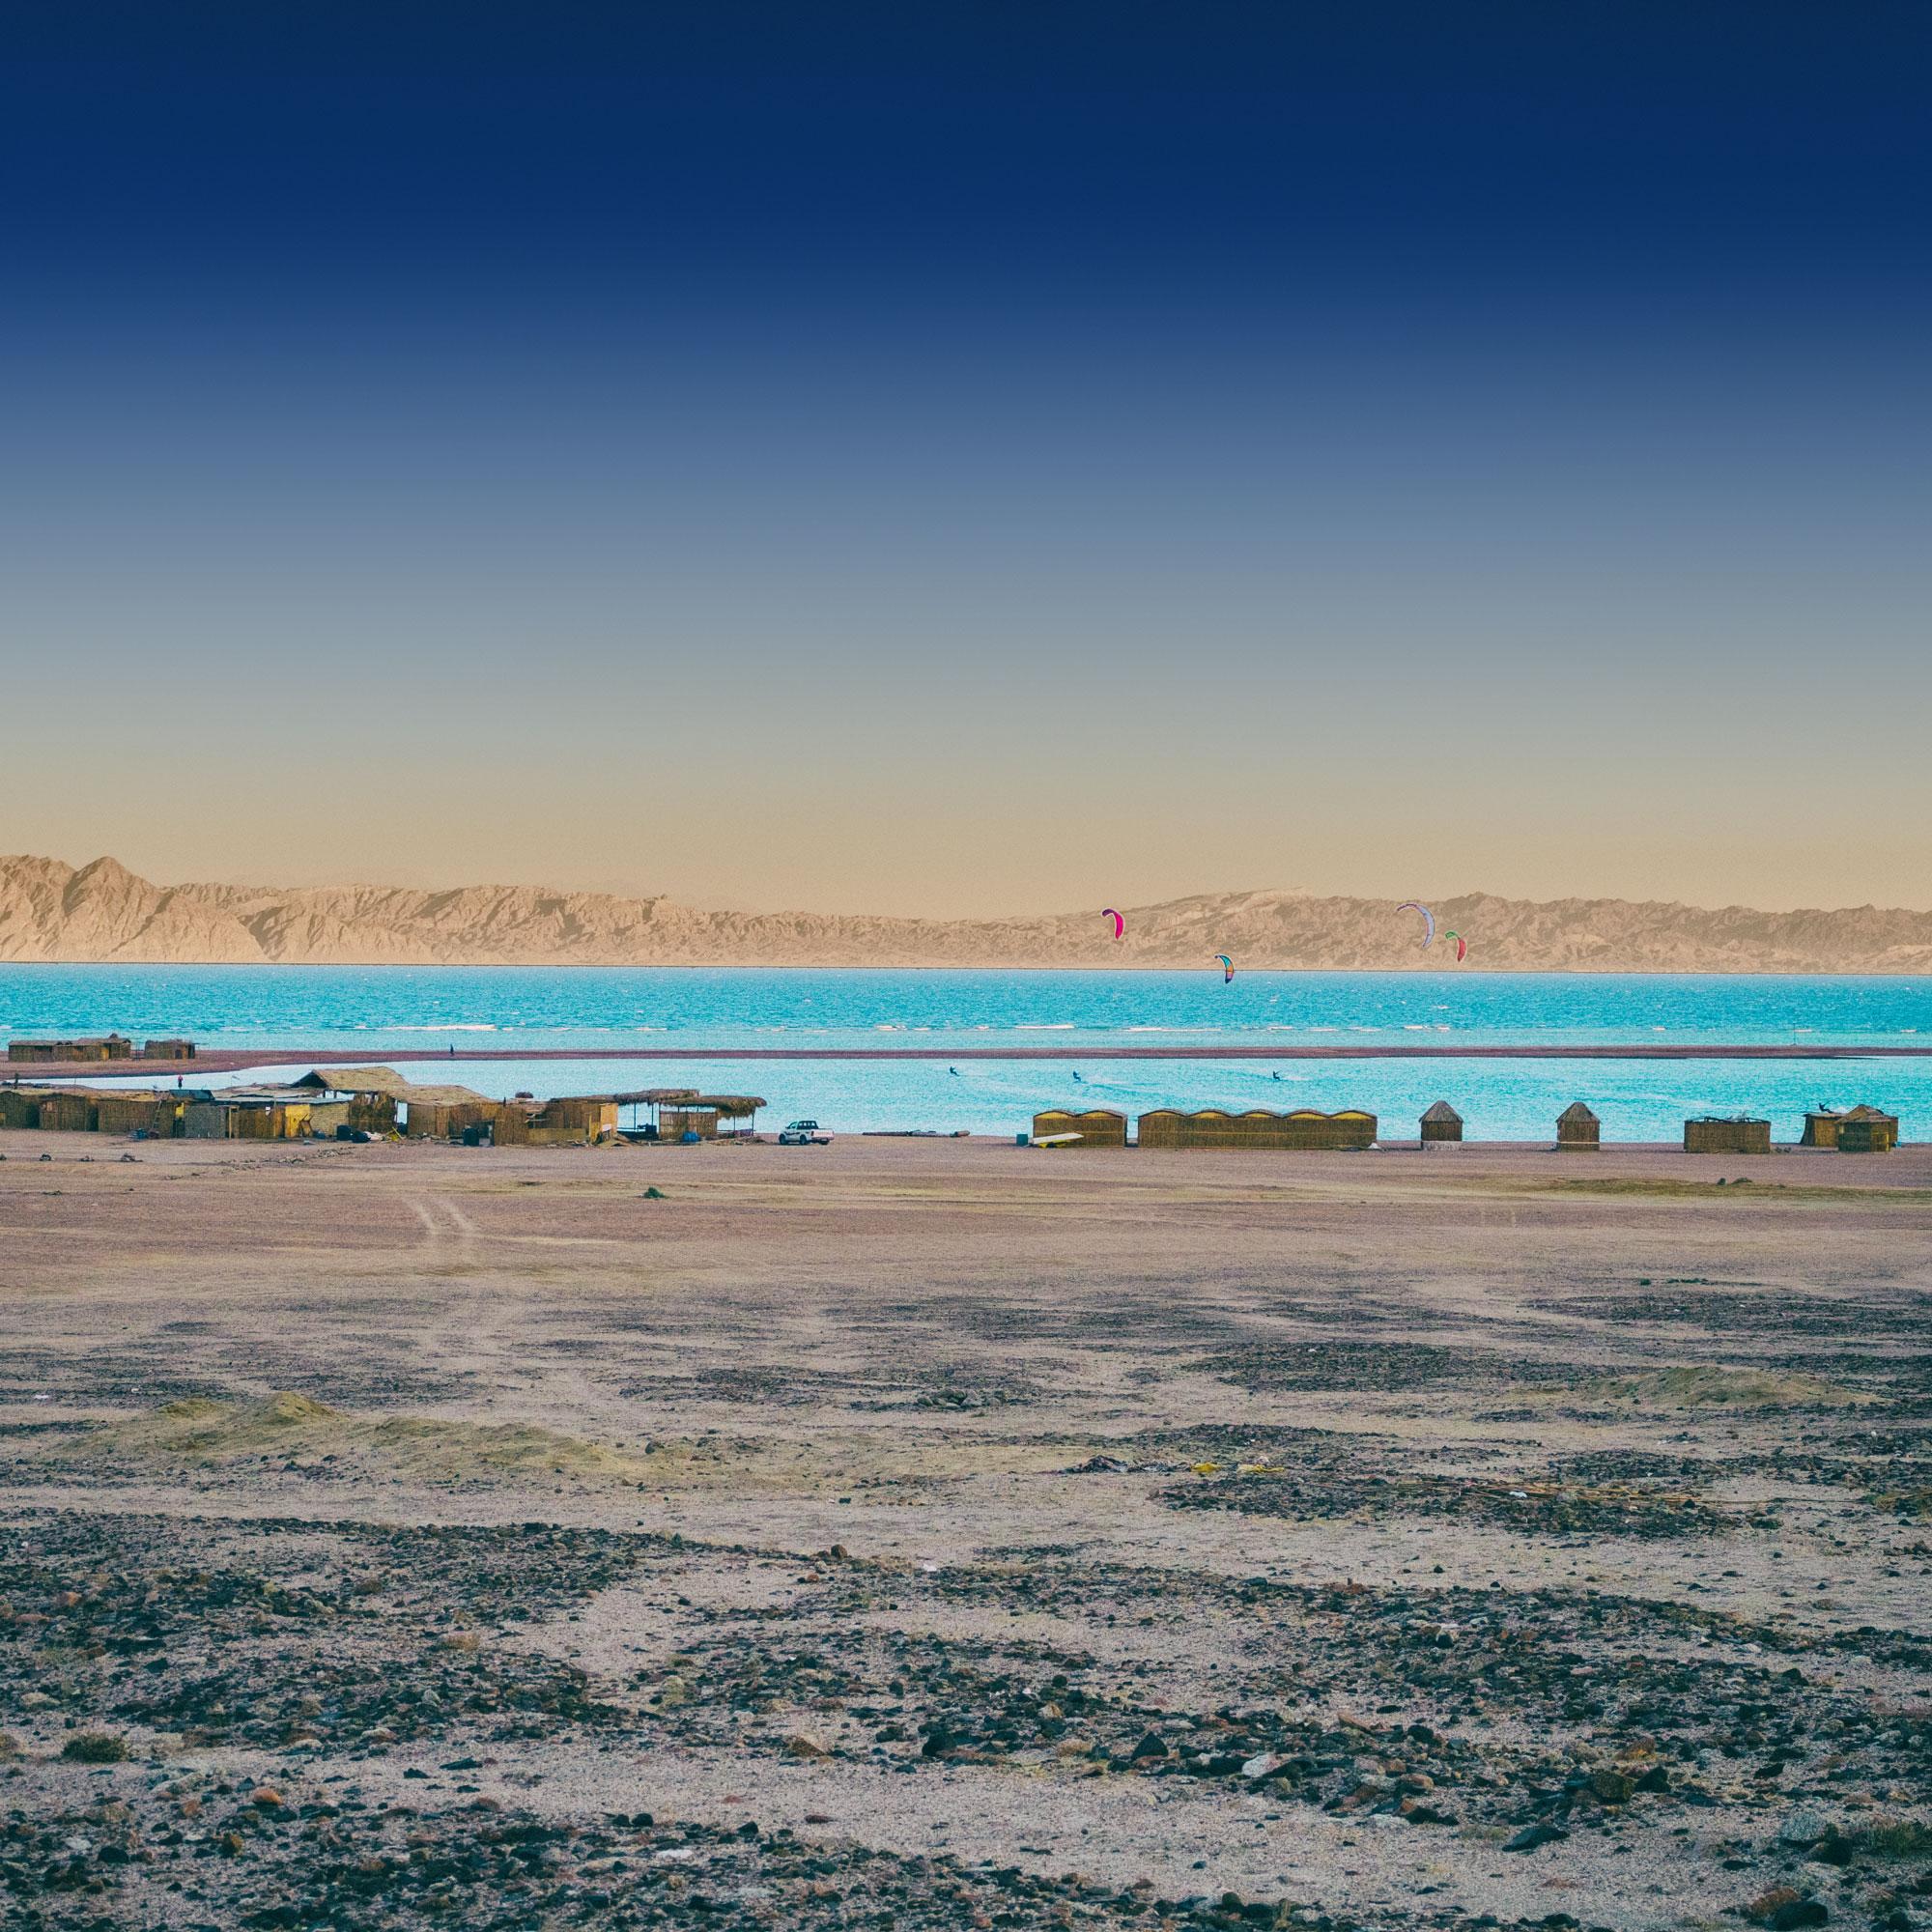 BlueLagoon Kitecamp in Dahab